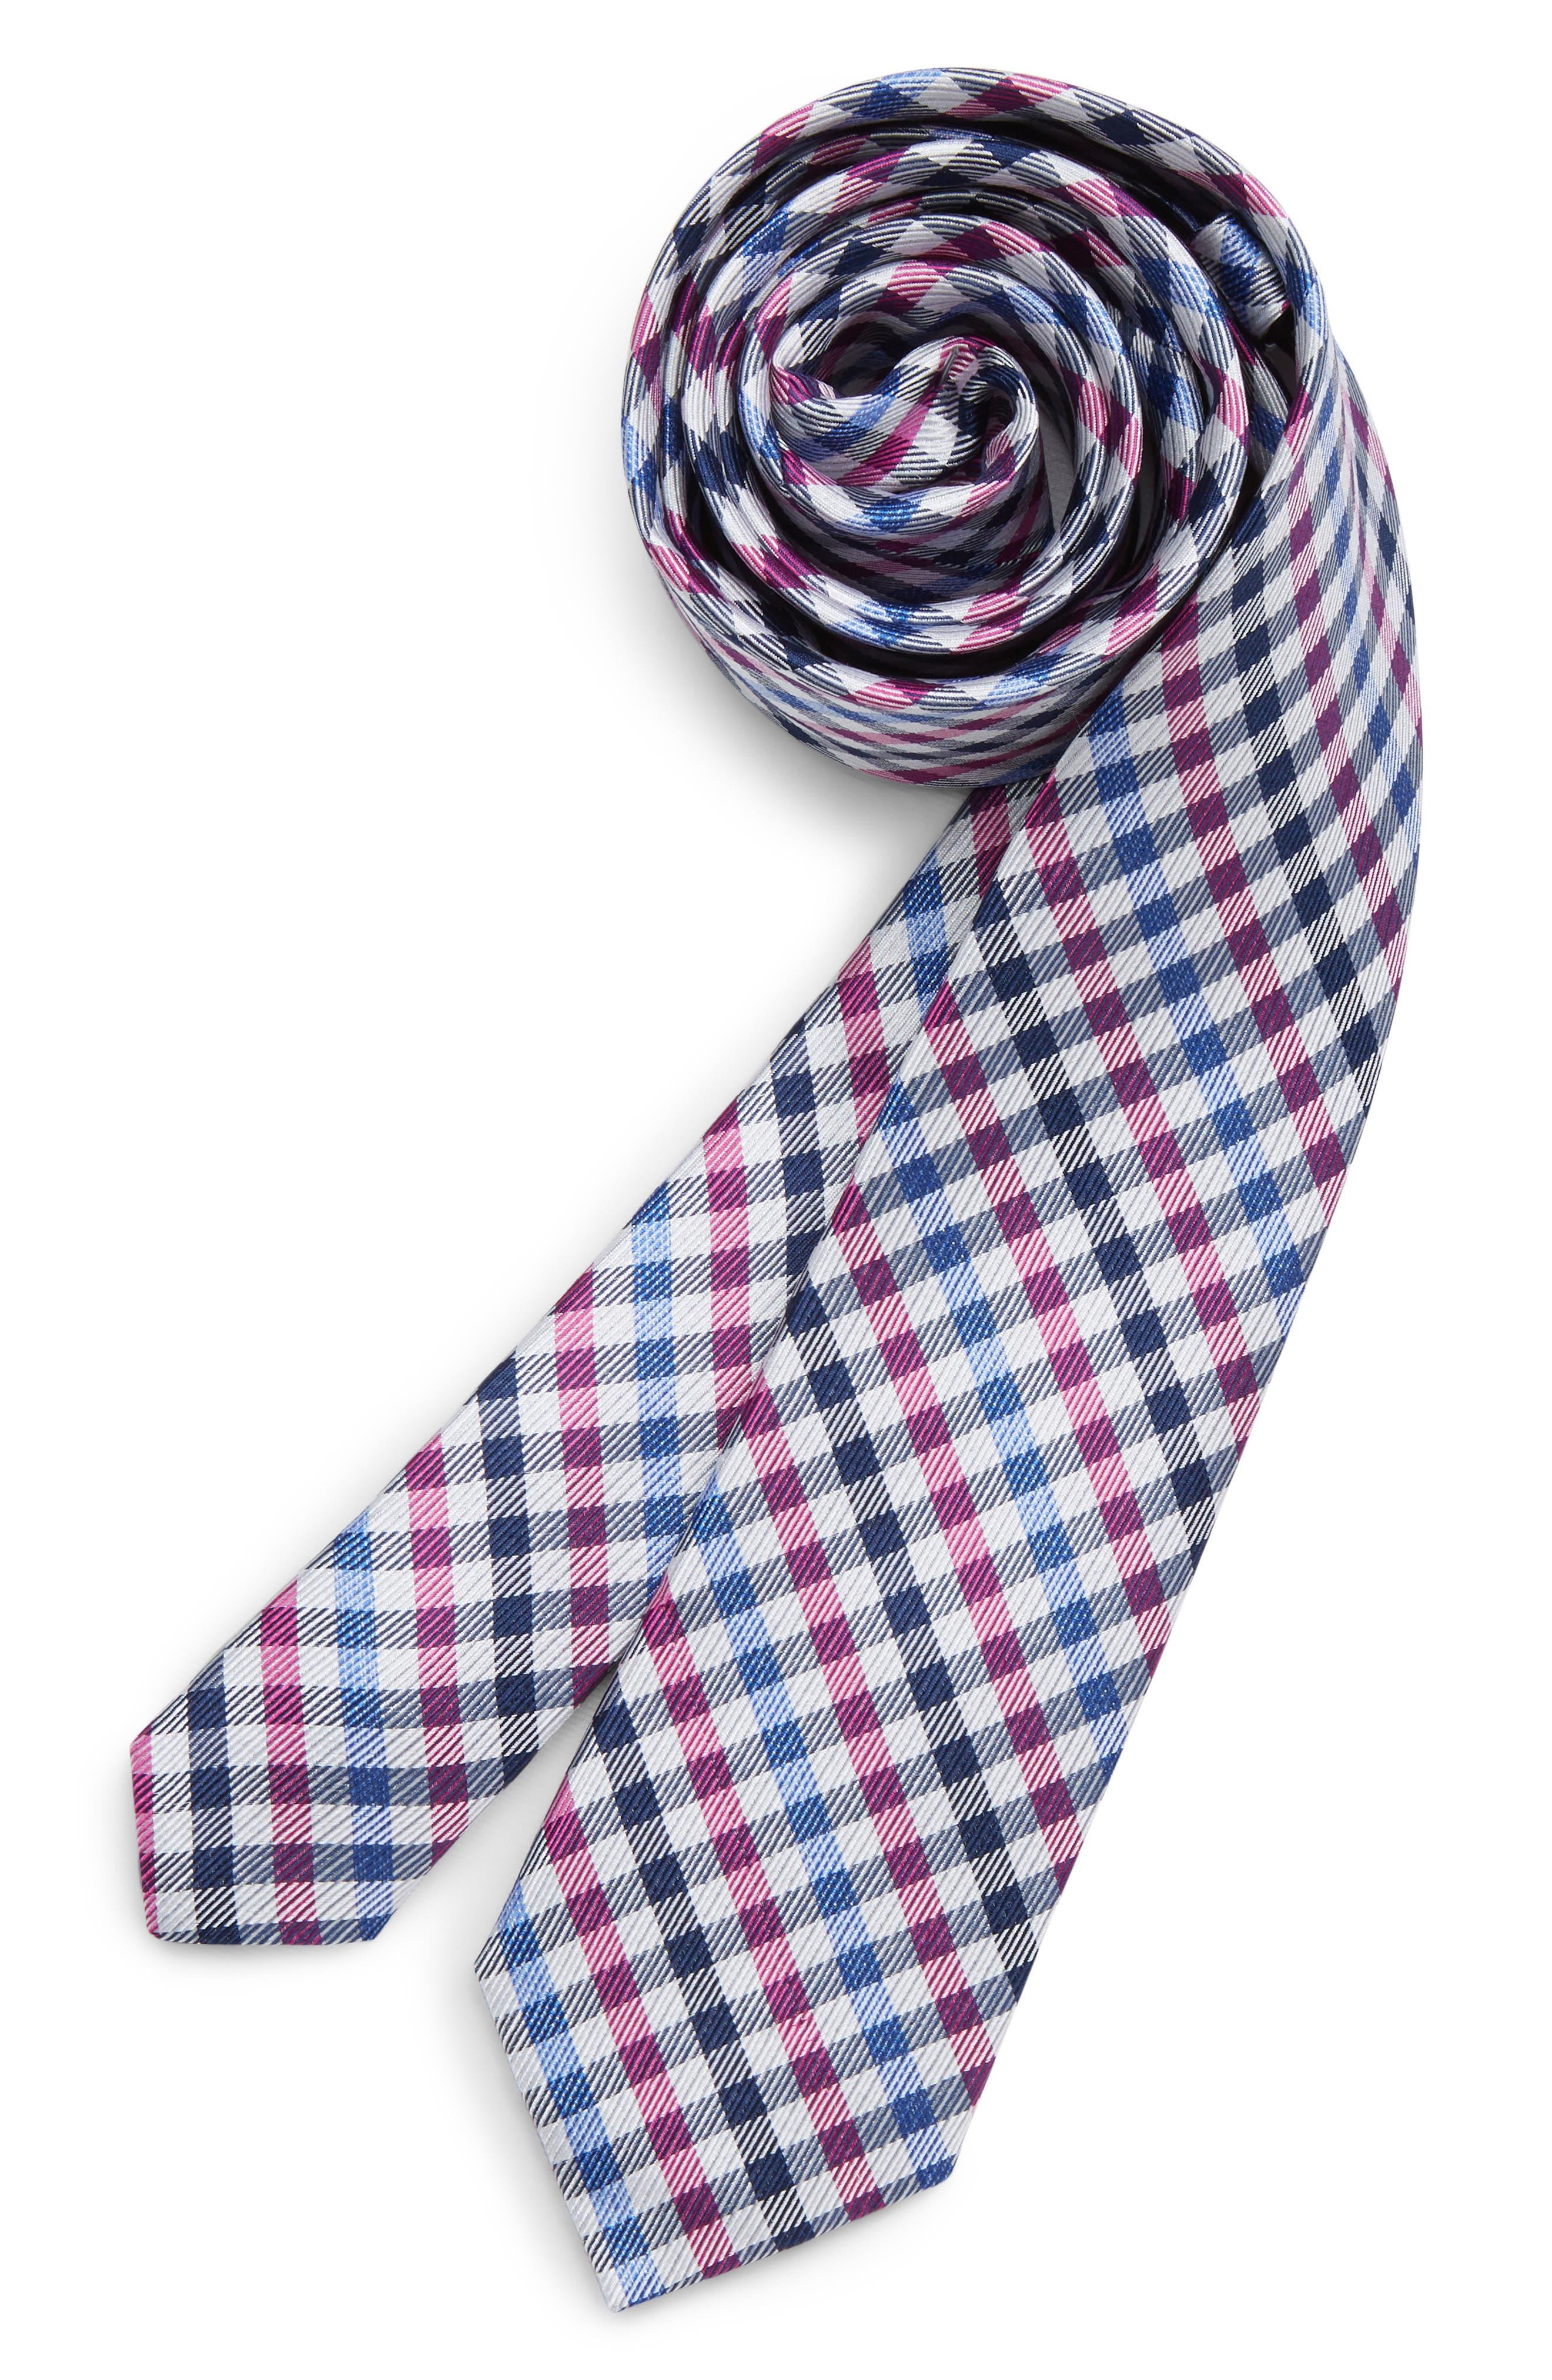 MICHAEL KORS,                             Check Silk Tie,                             Main thumbnail 1, color,                             FUCHSIA